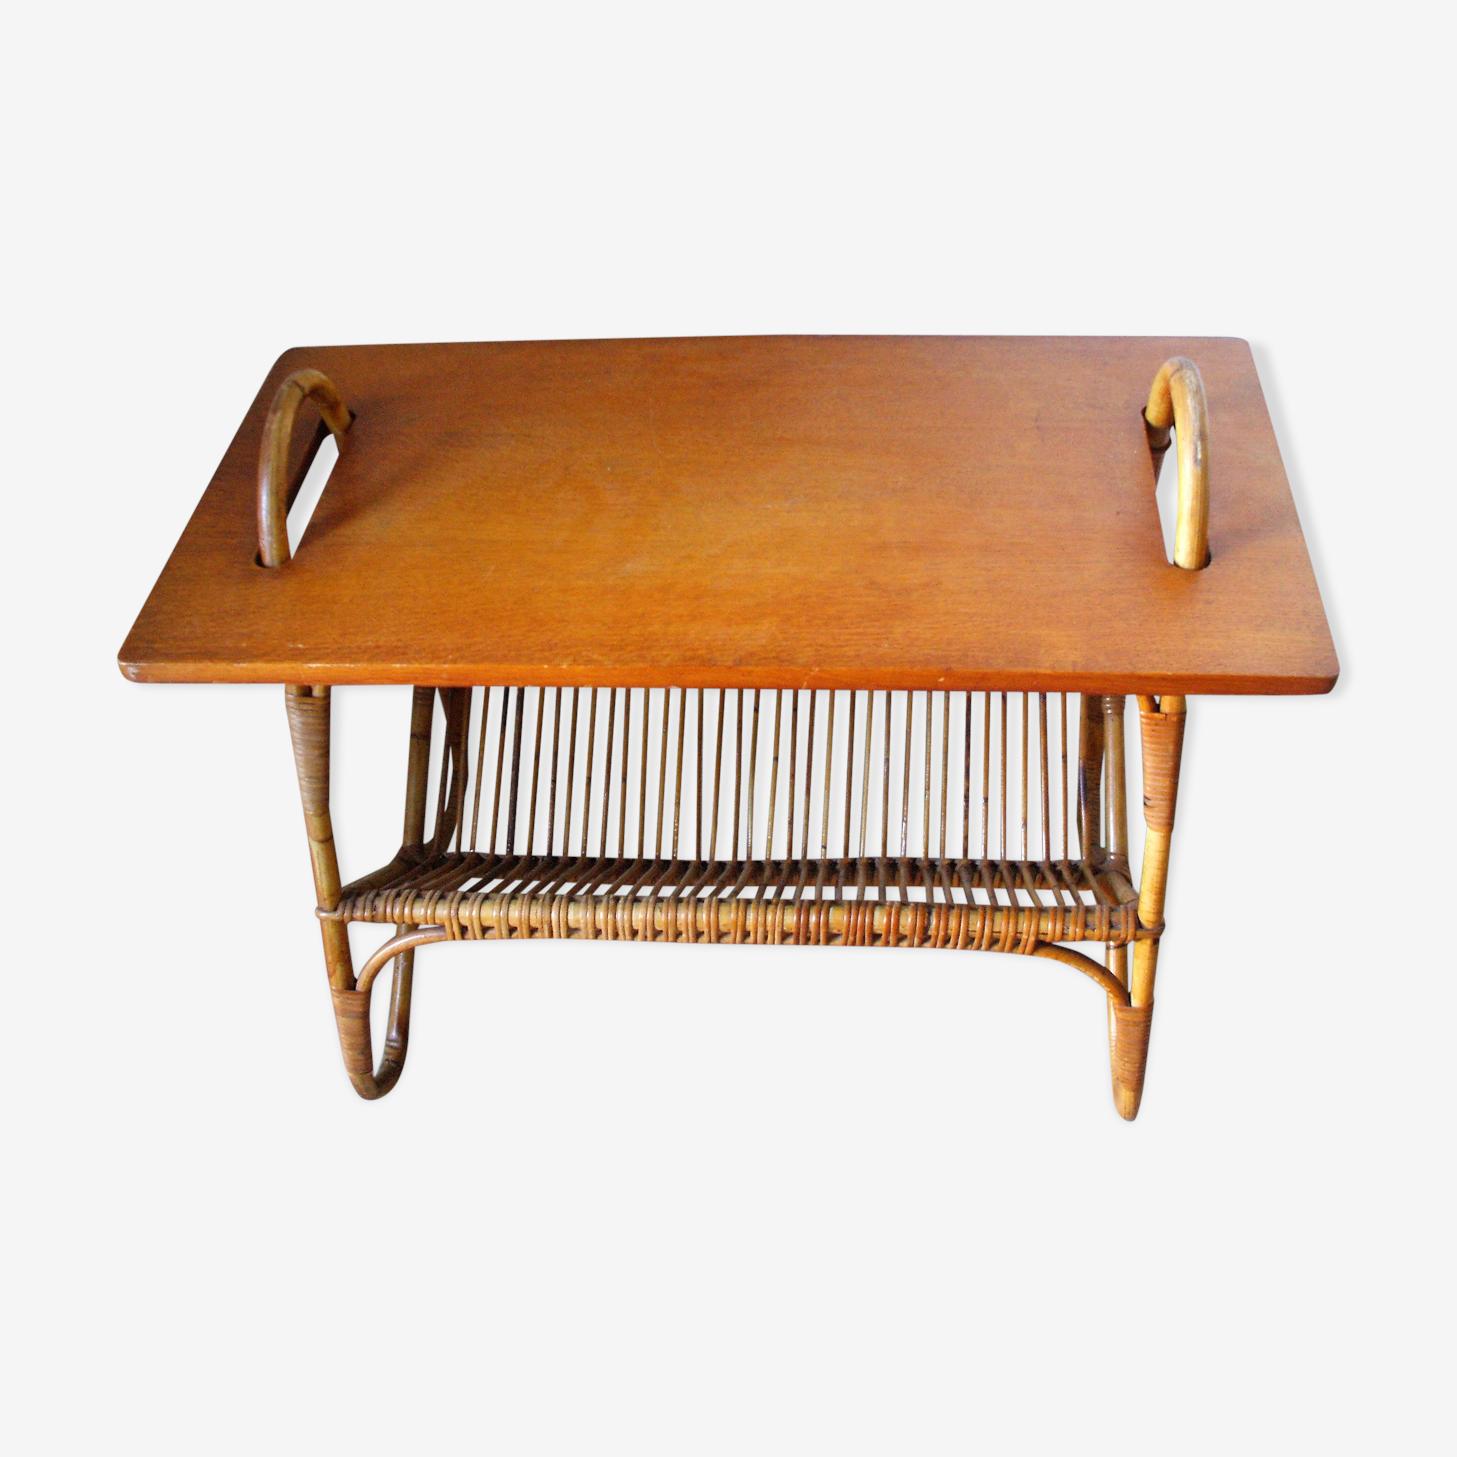 Table basse en rotin avec plateau bois